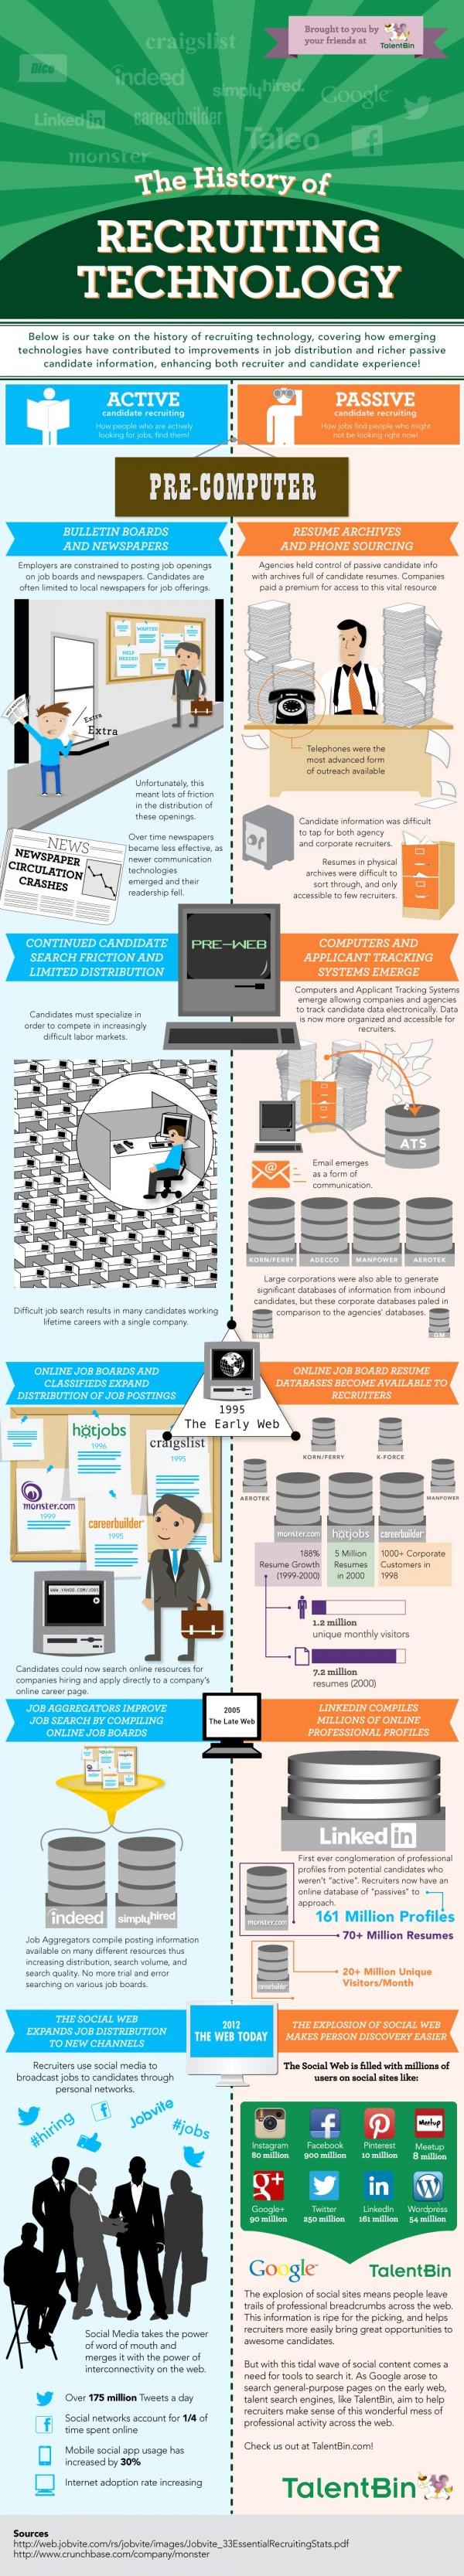 The Evolution Of Recruitment Technology Infographic Recruitment Infographic Technology